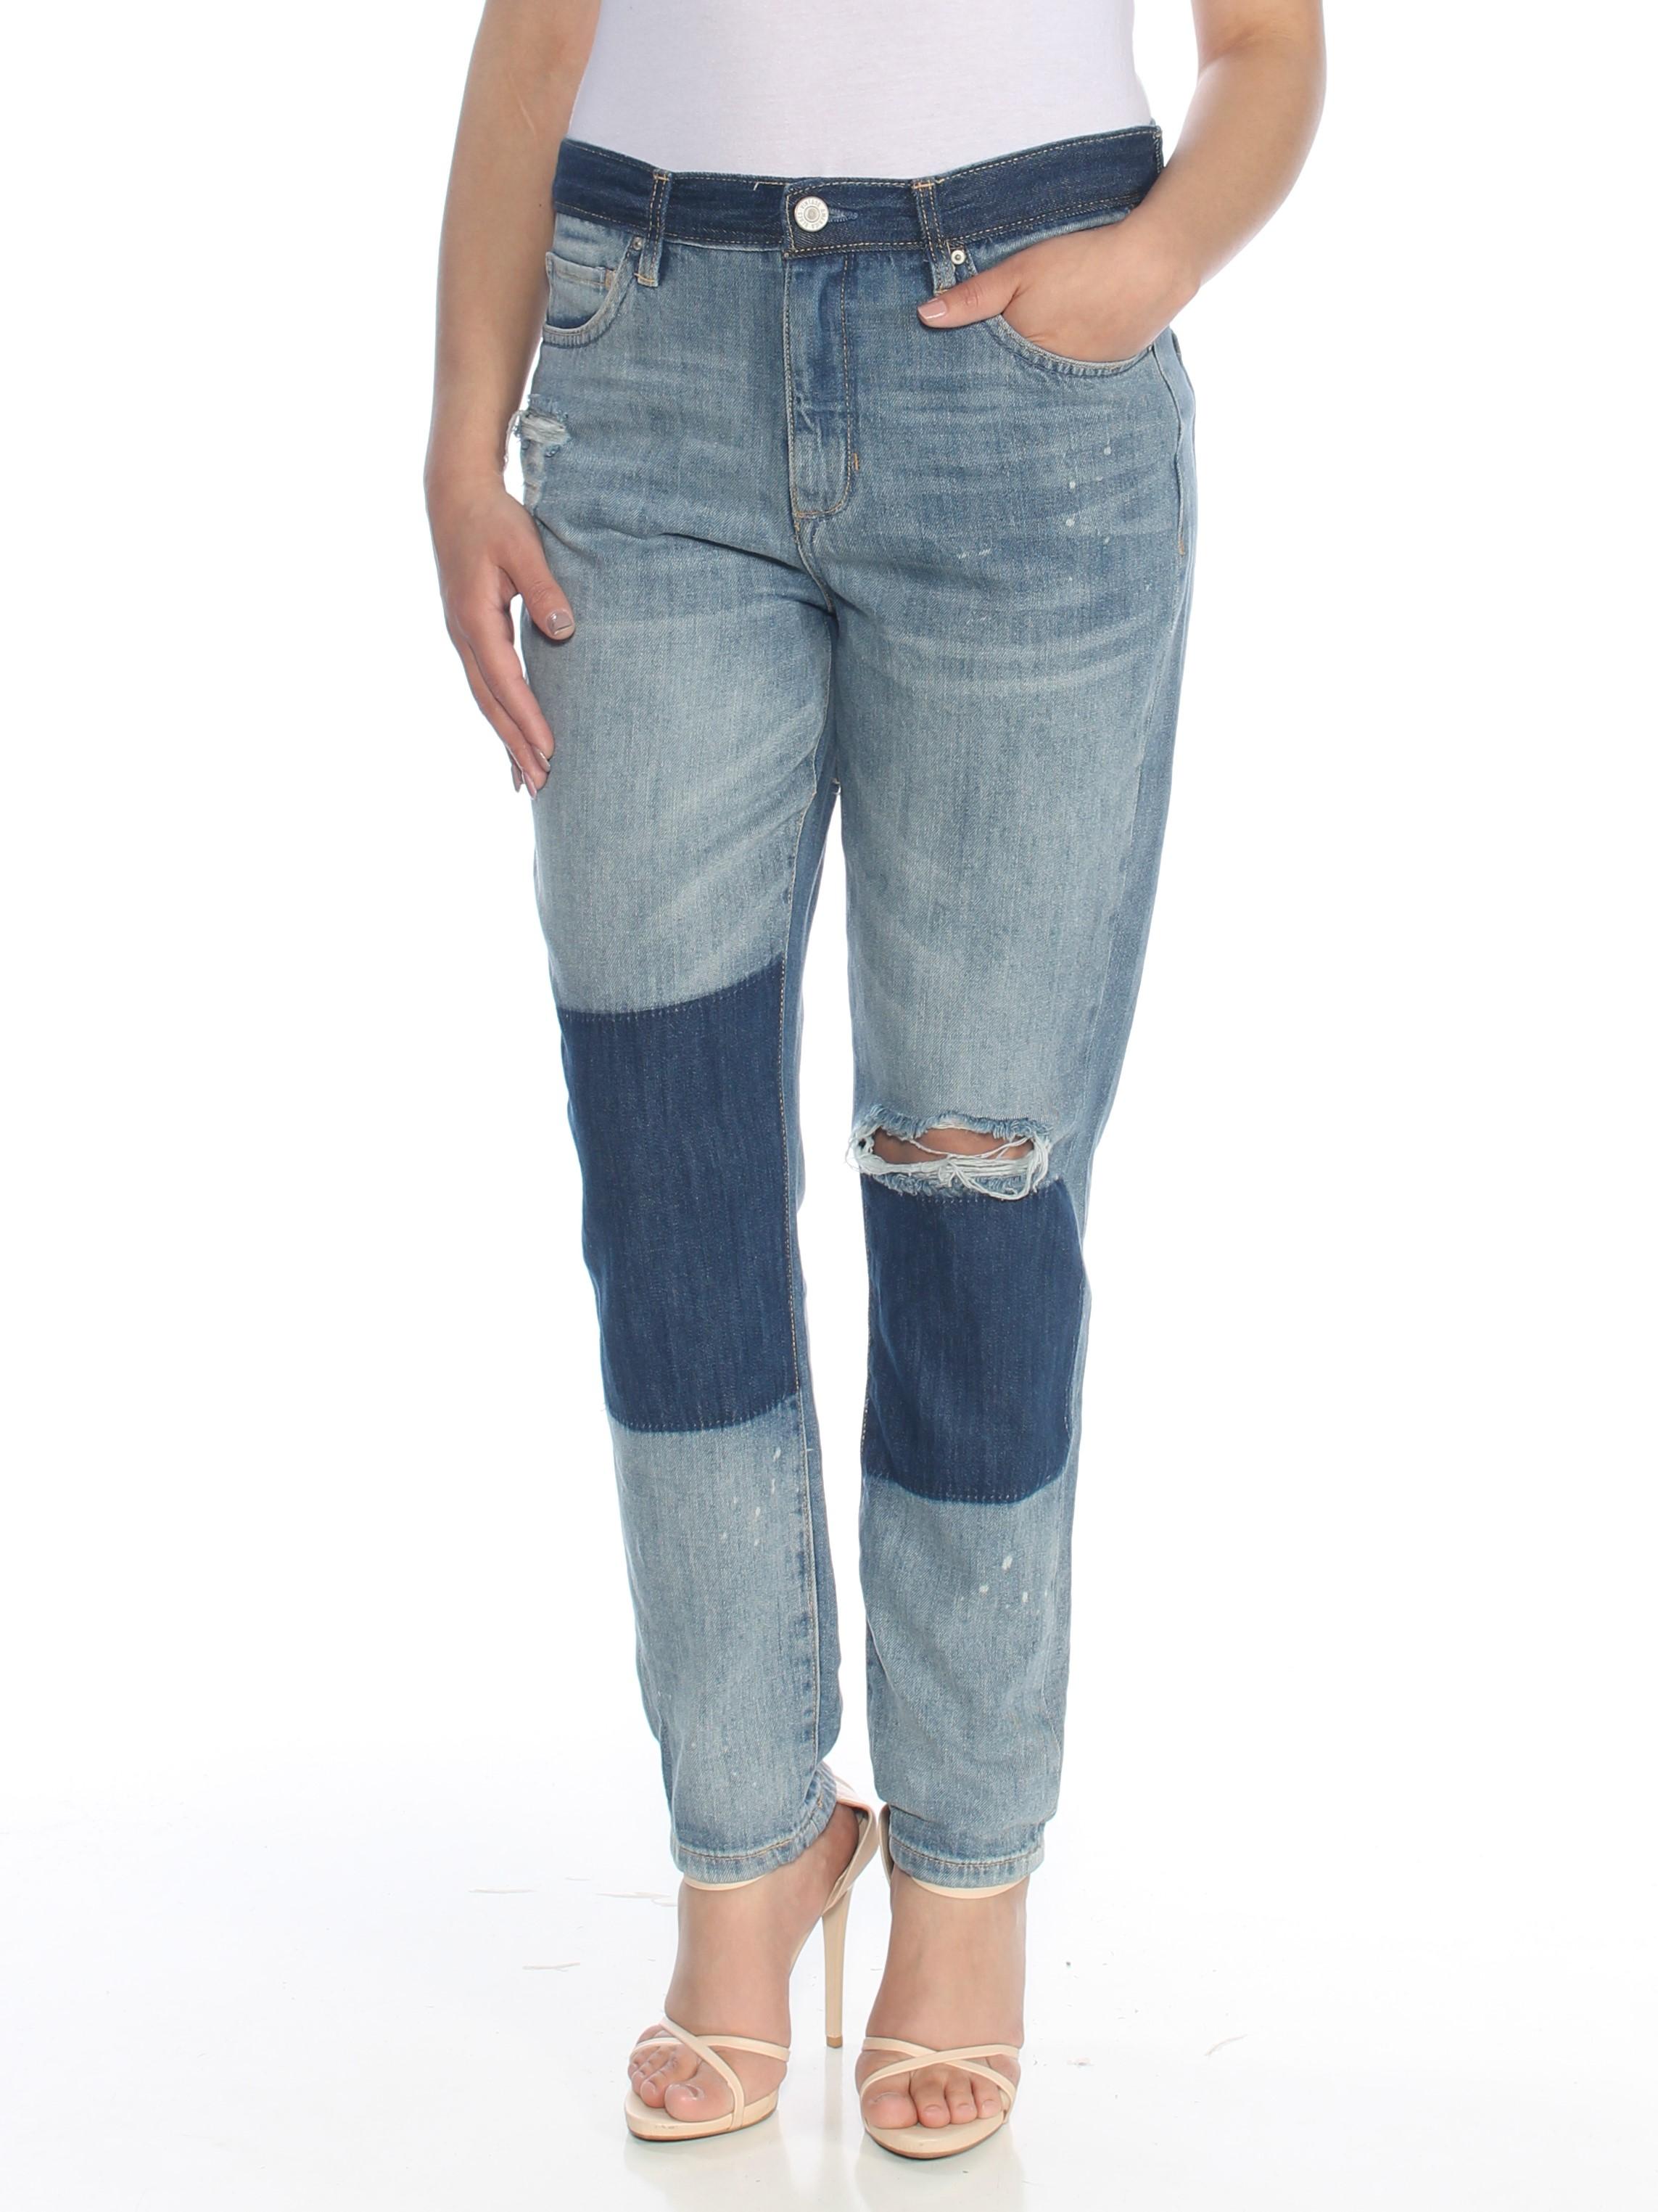 97f51553ec VINTAGE AMERICA BLUES $79 Womens Blue Patched Frayed Straight leg Jeans 4  B+B